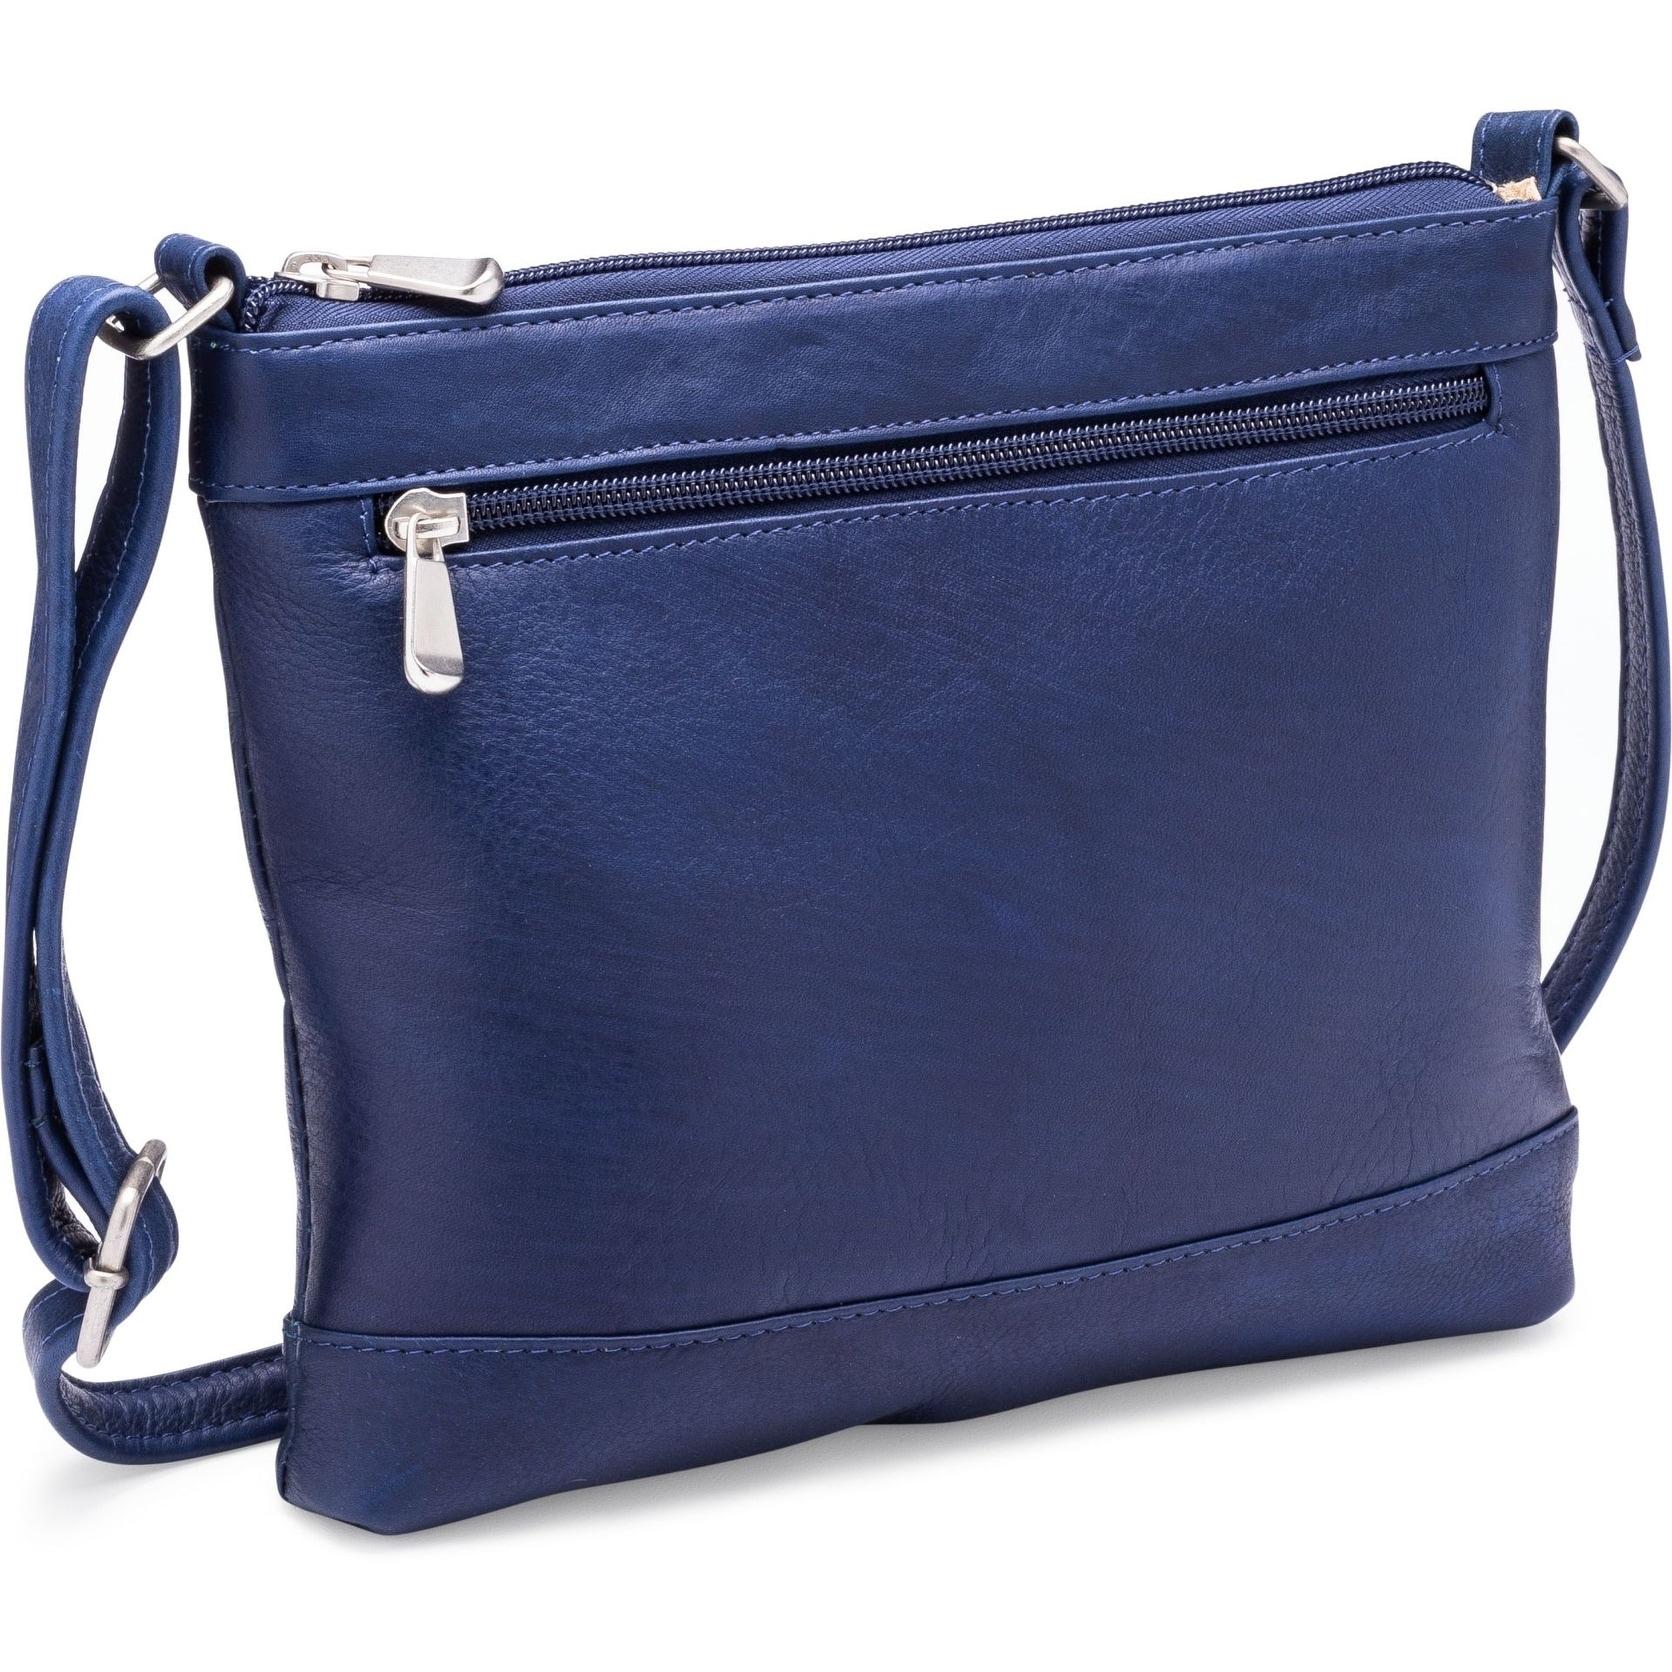 e440198cf4f6 LeDonne Leather Savanna Crossbody Handbag